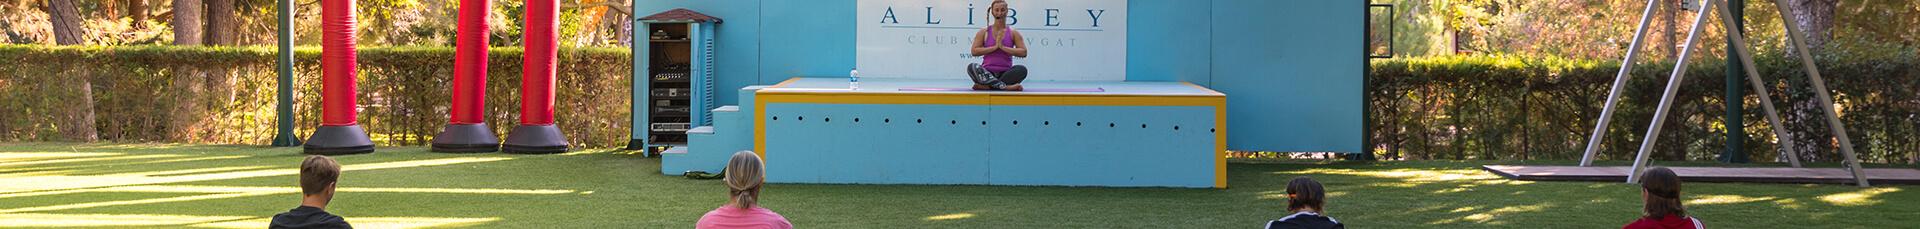 Ali Bey Park Manavgat - Fitness First İle Zinde Kalın-ru